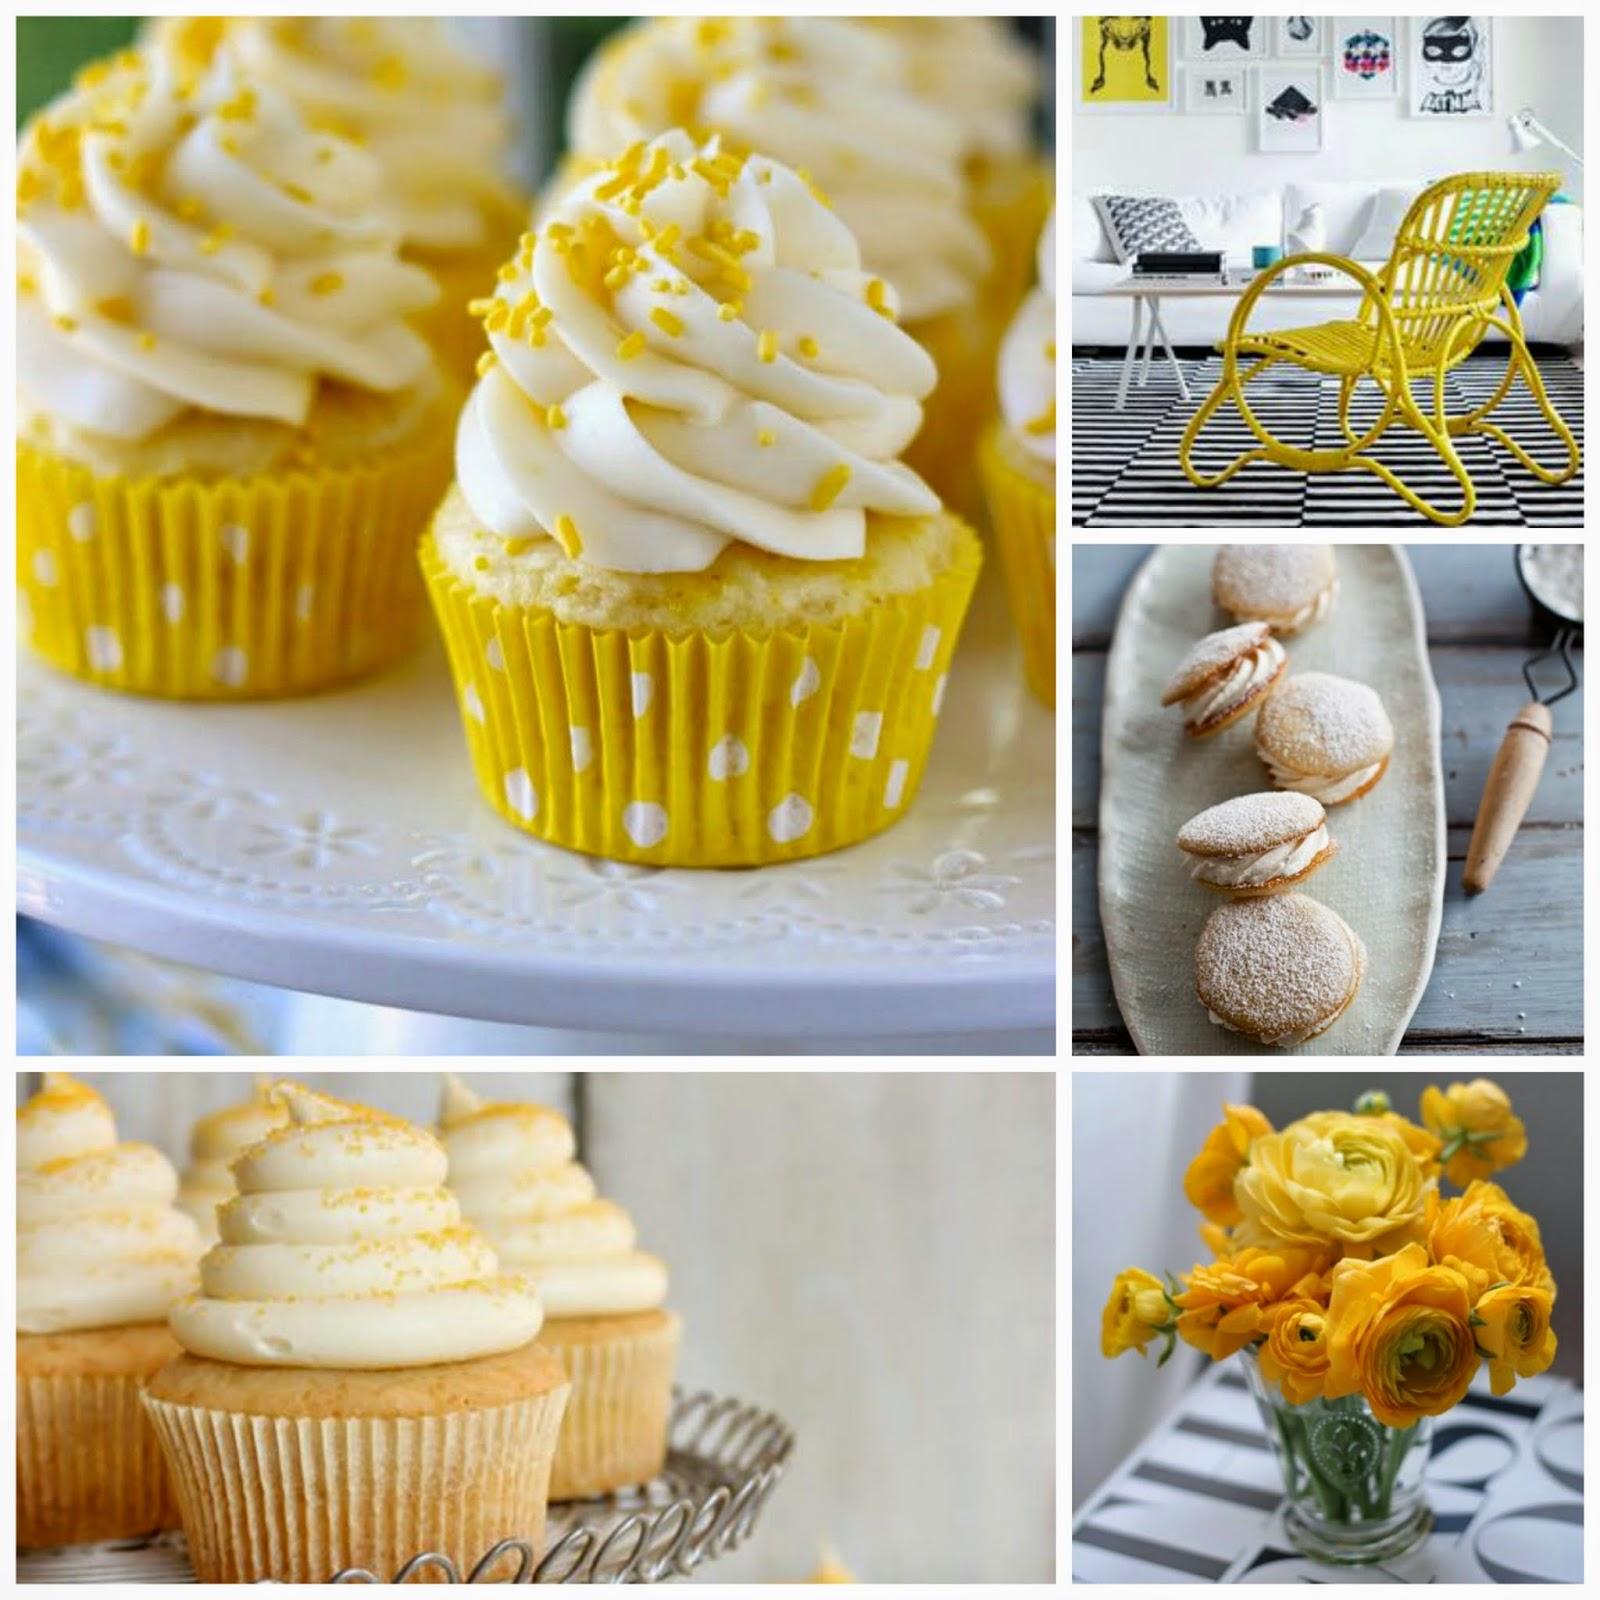 lemon cream / crema al limone